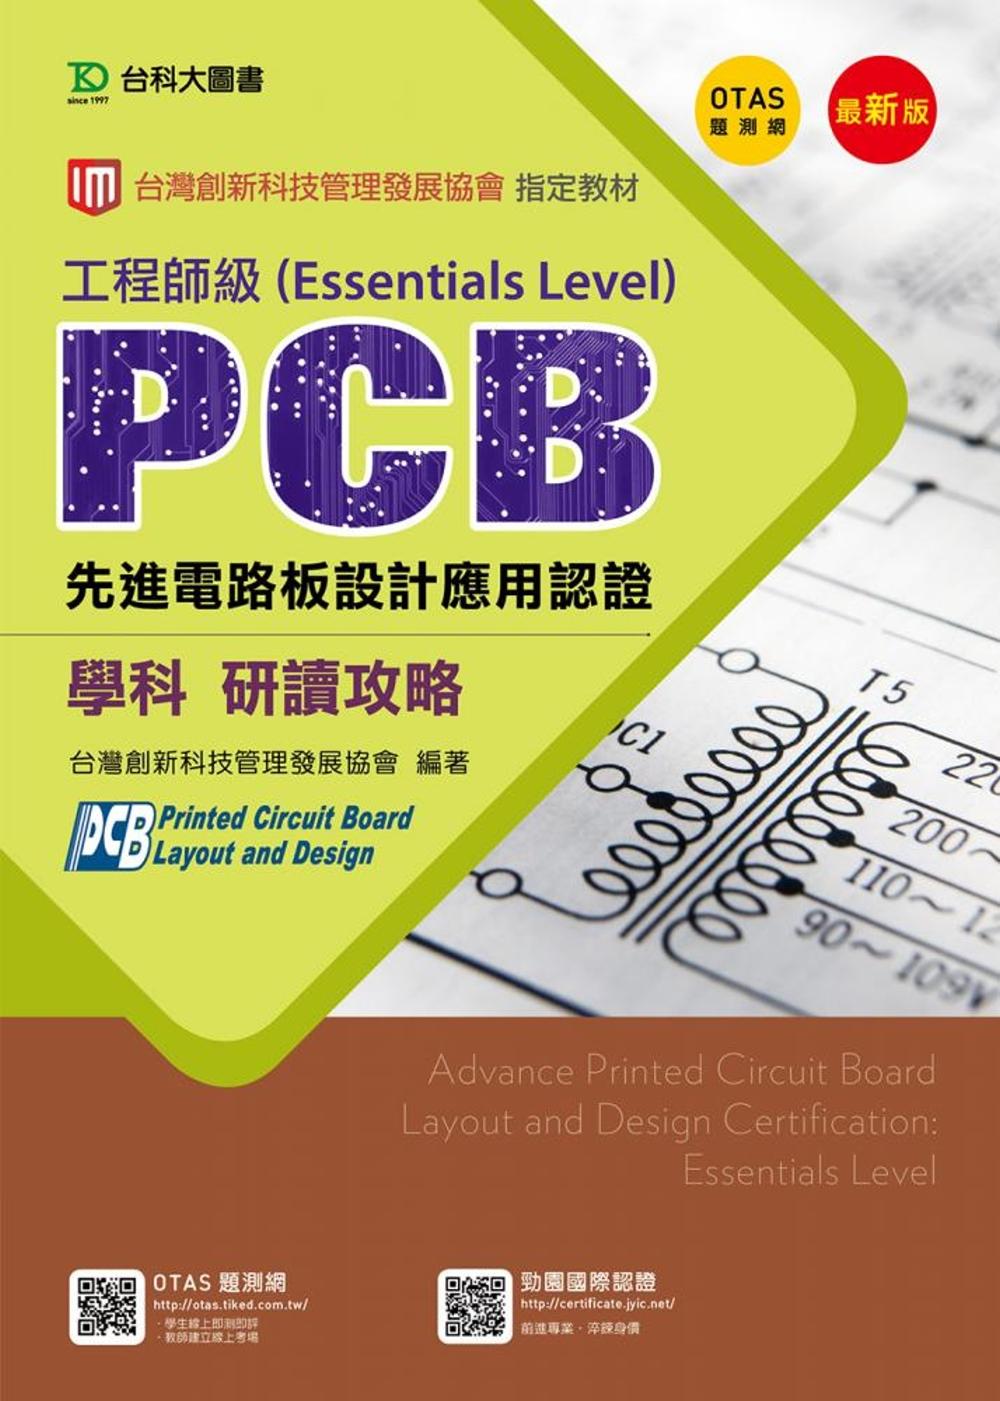 PCB先進電路板 應用 工程師級^(Essentials Level^)學科研讀攻略 ~